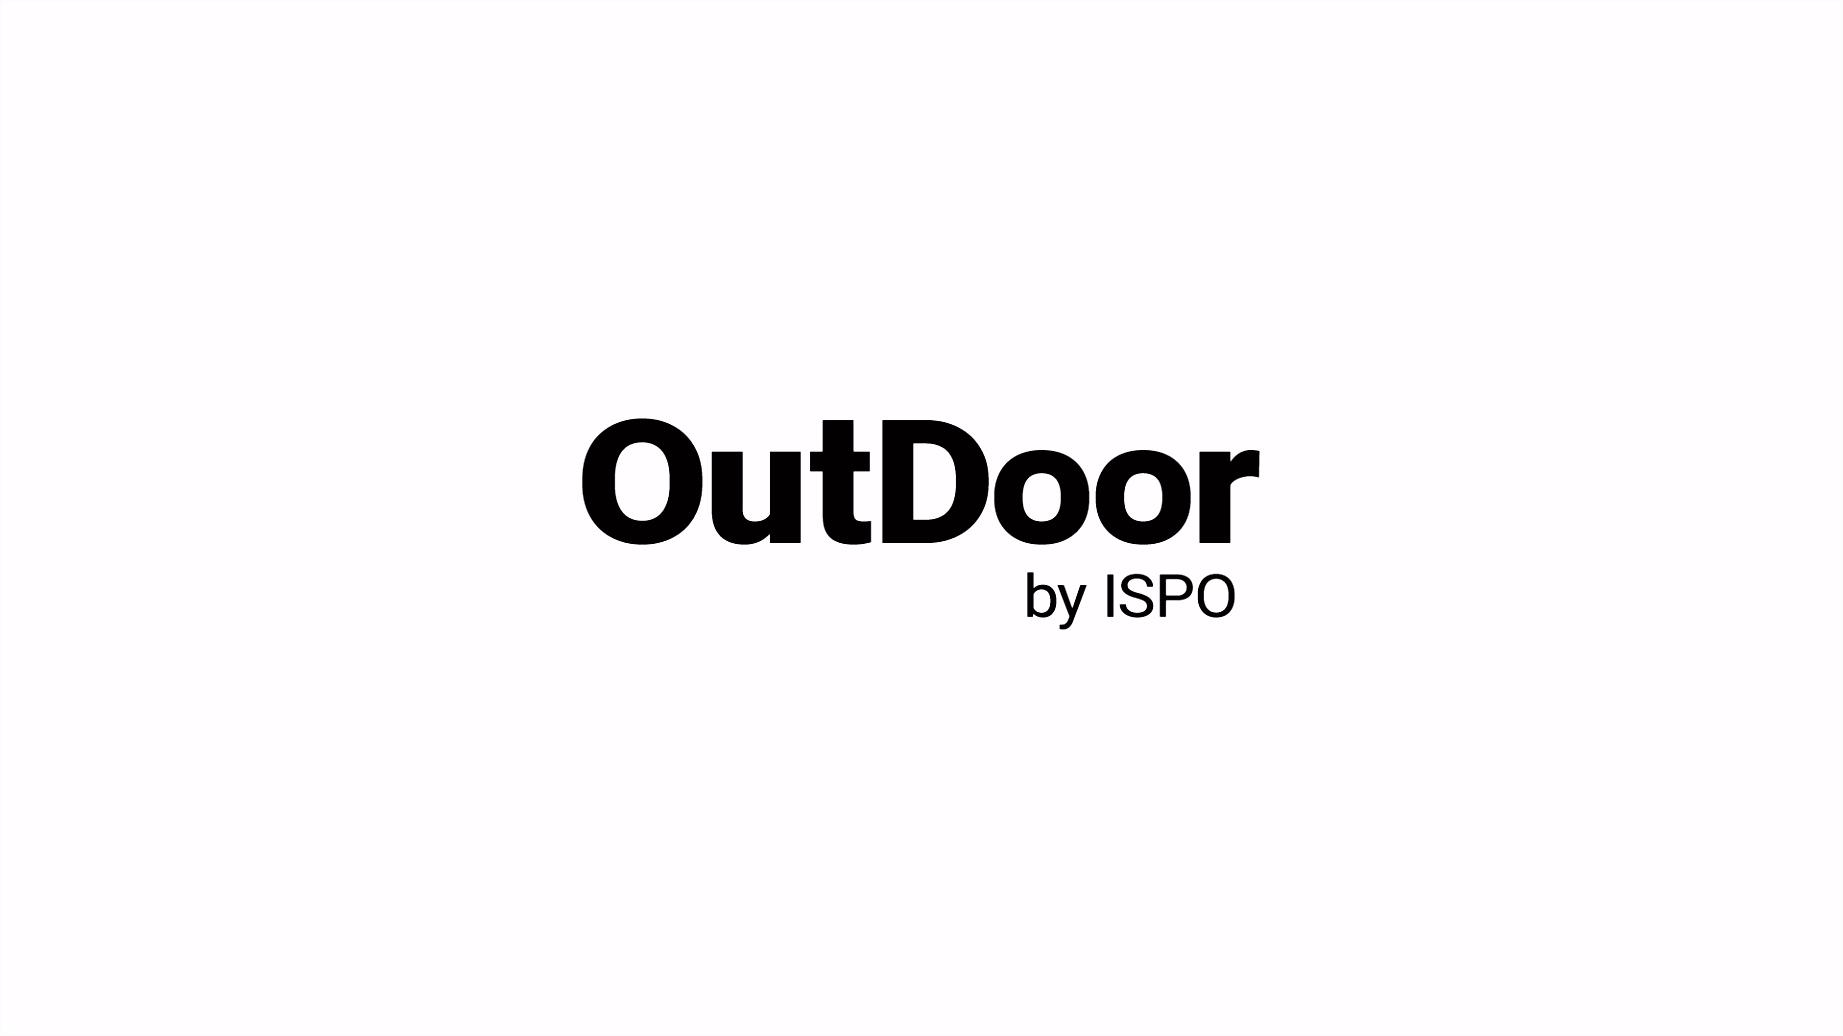 OutDoor by ISPO Corporate Design Dorten studios creative consultancy